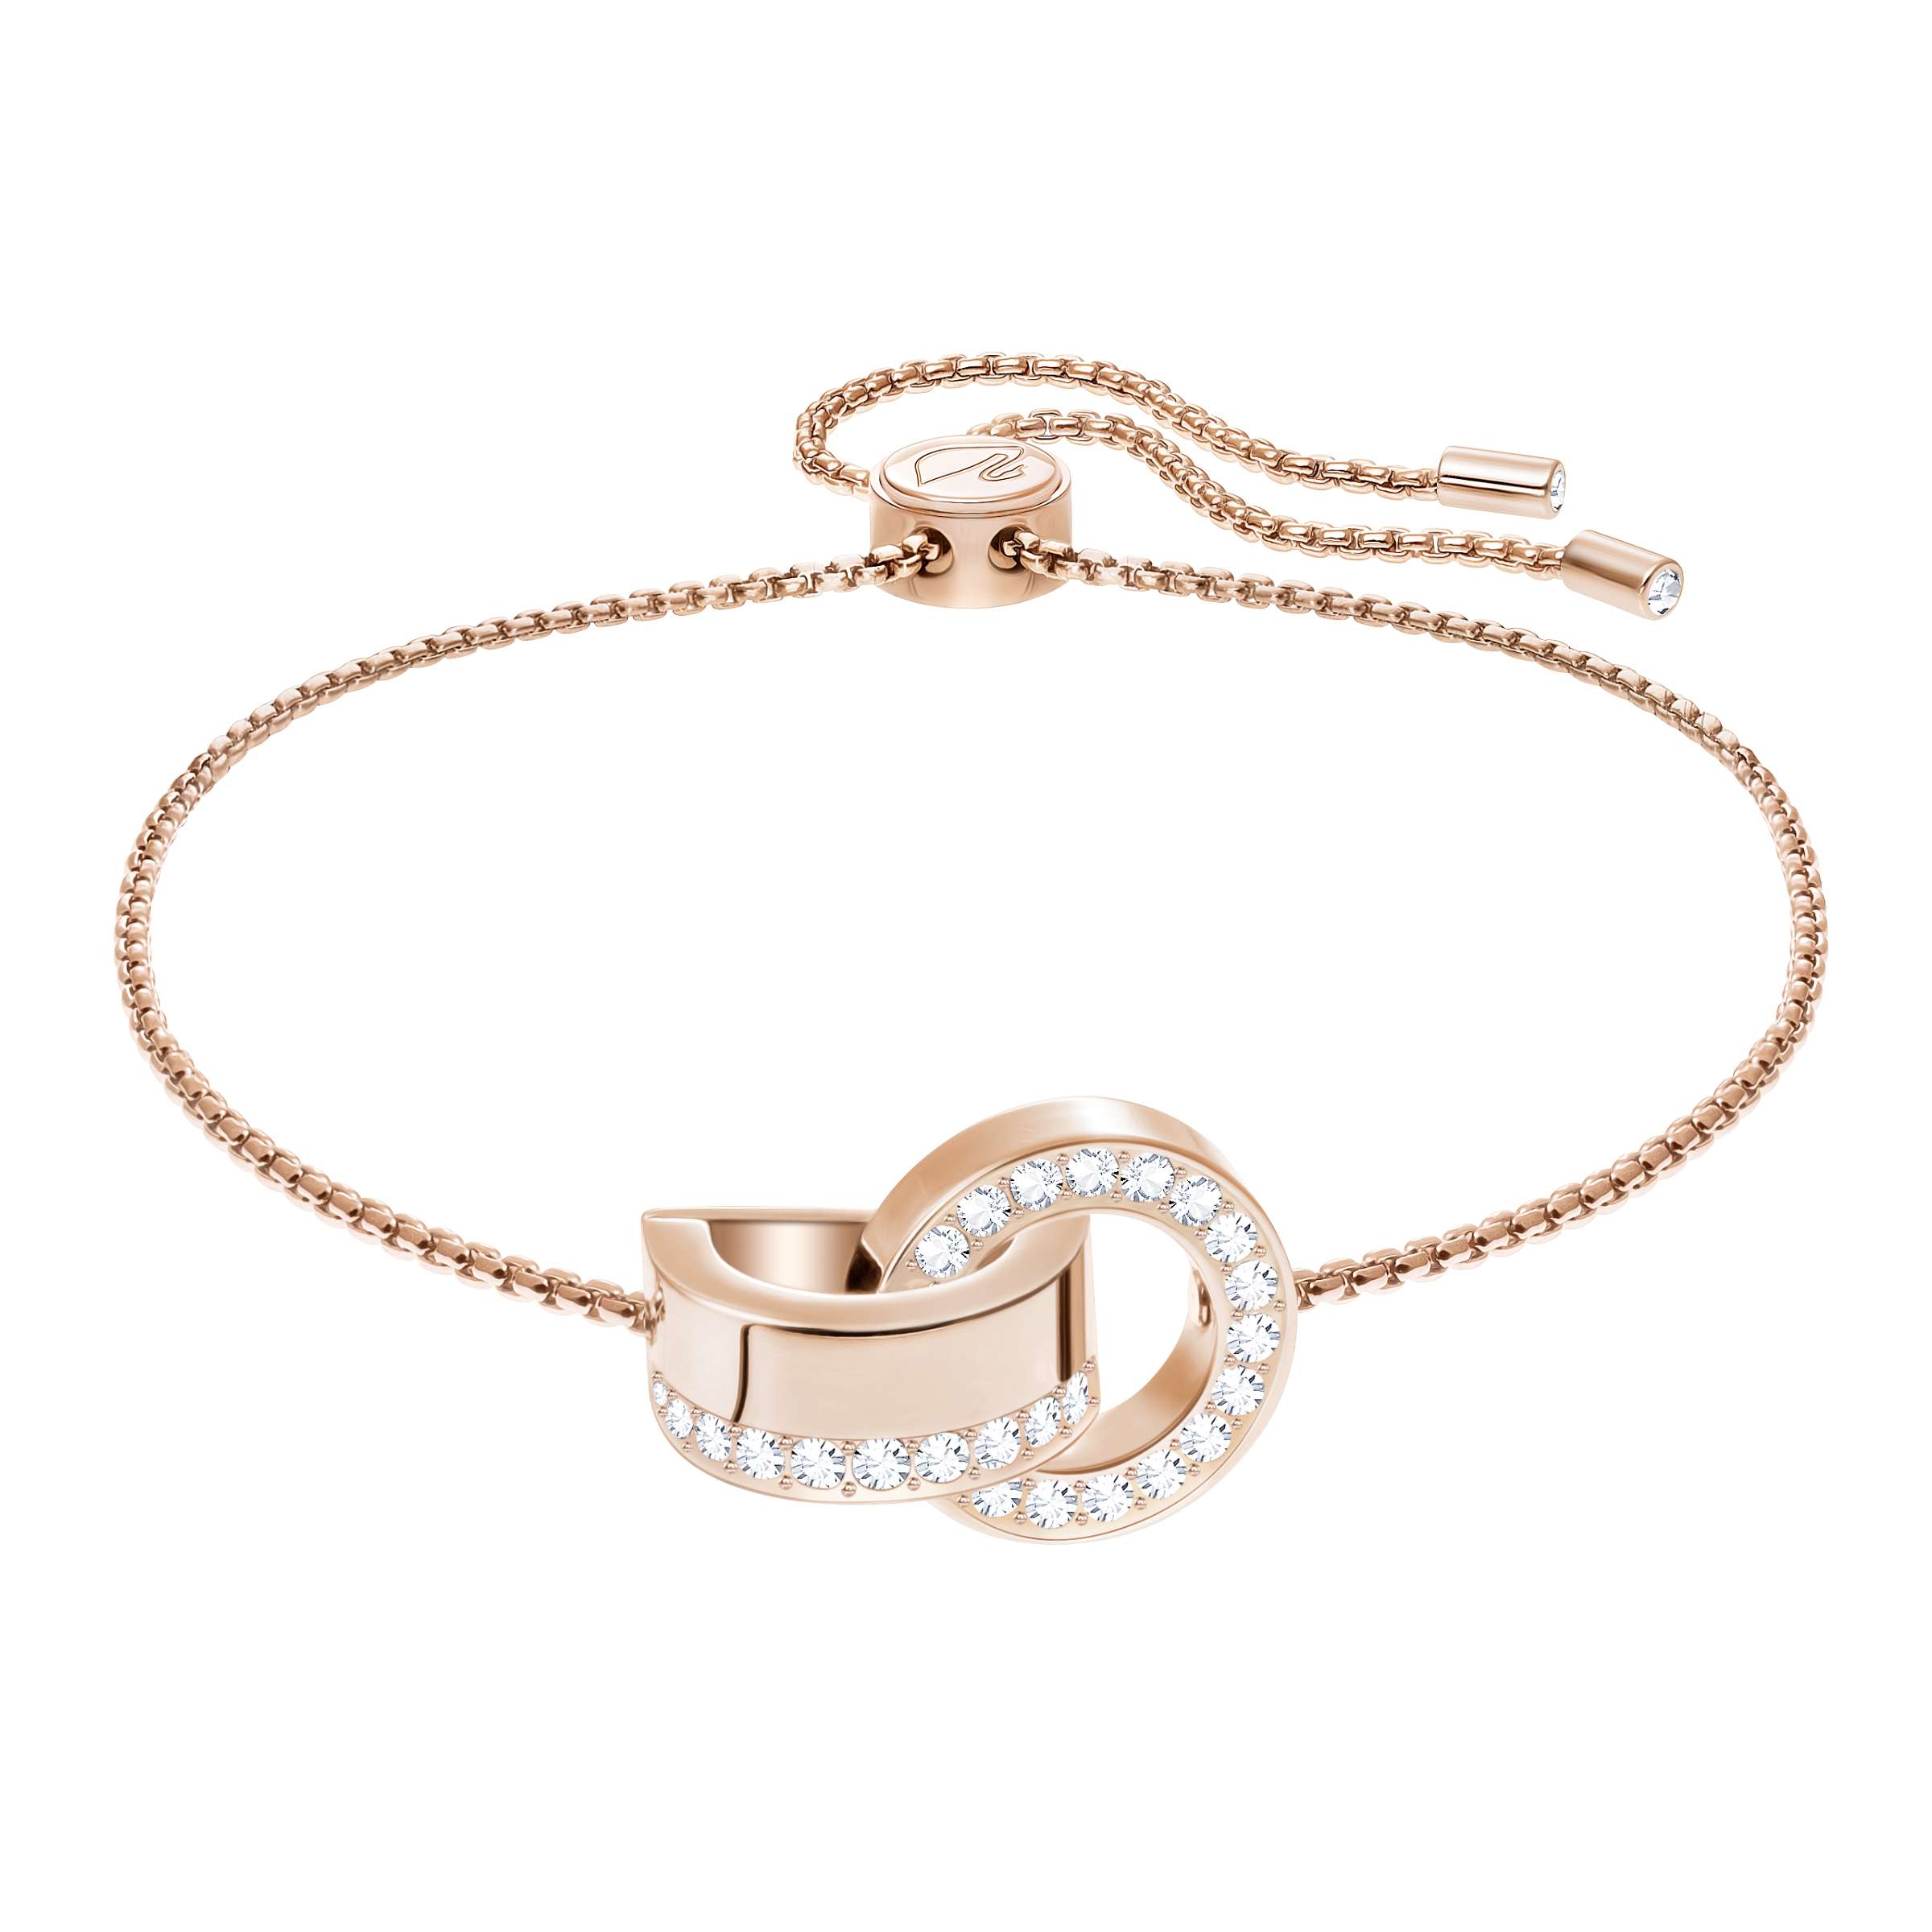 Hollow Bracelet, White, Rose Gold Plating